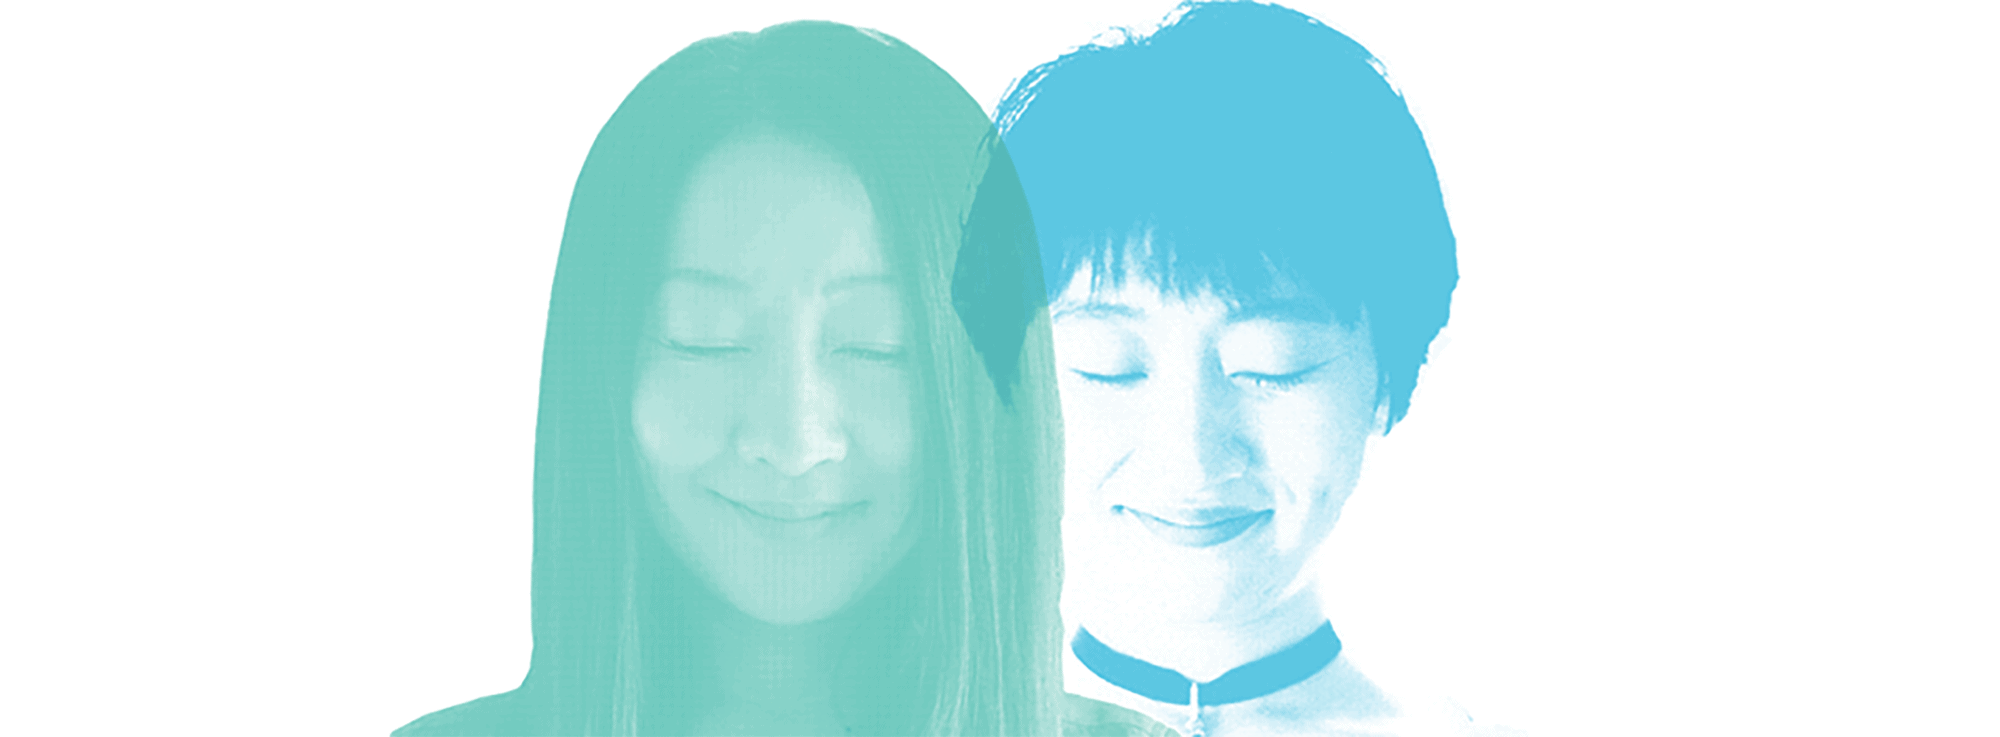 Natsuko Kondo's Web